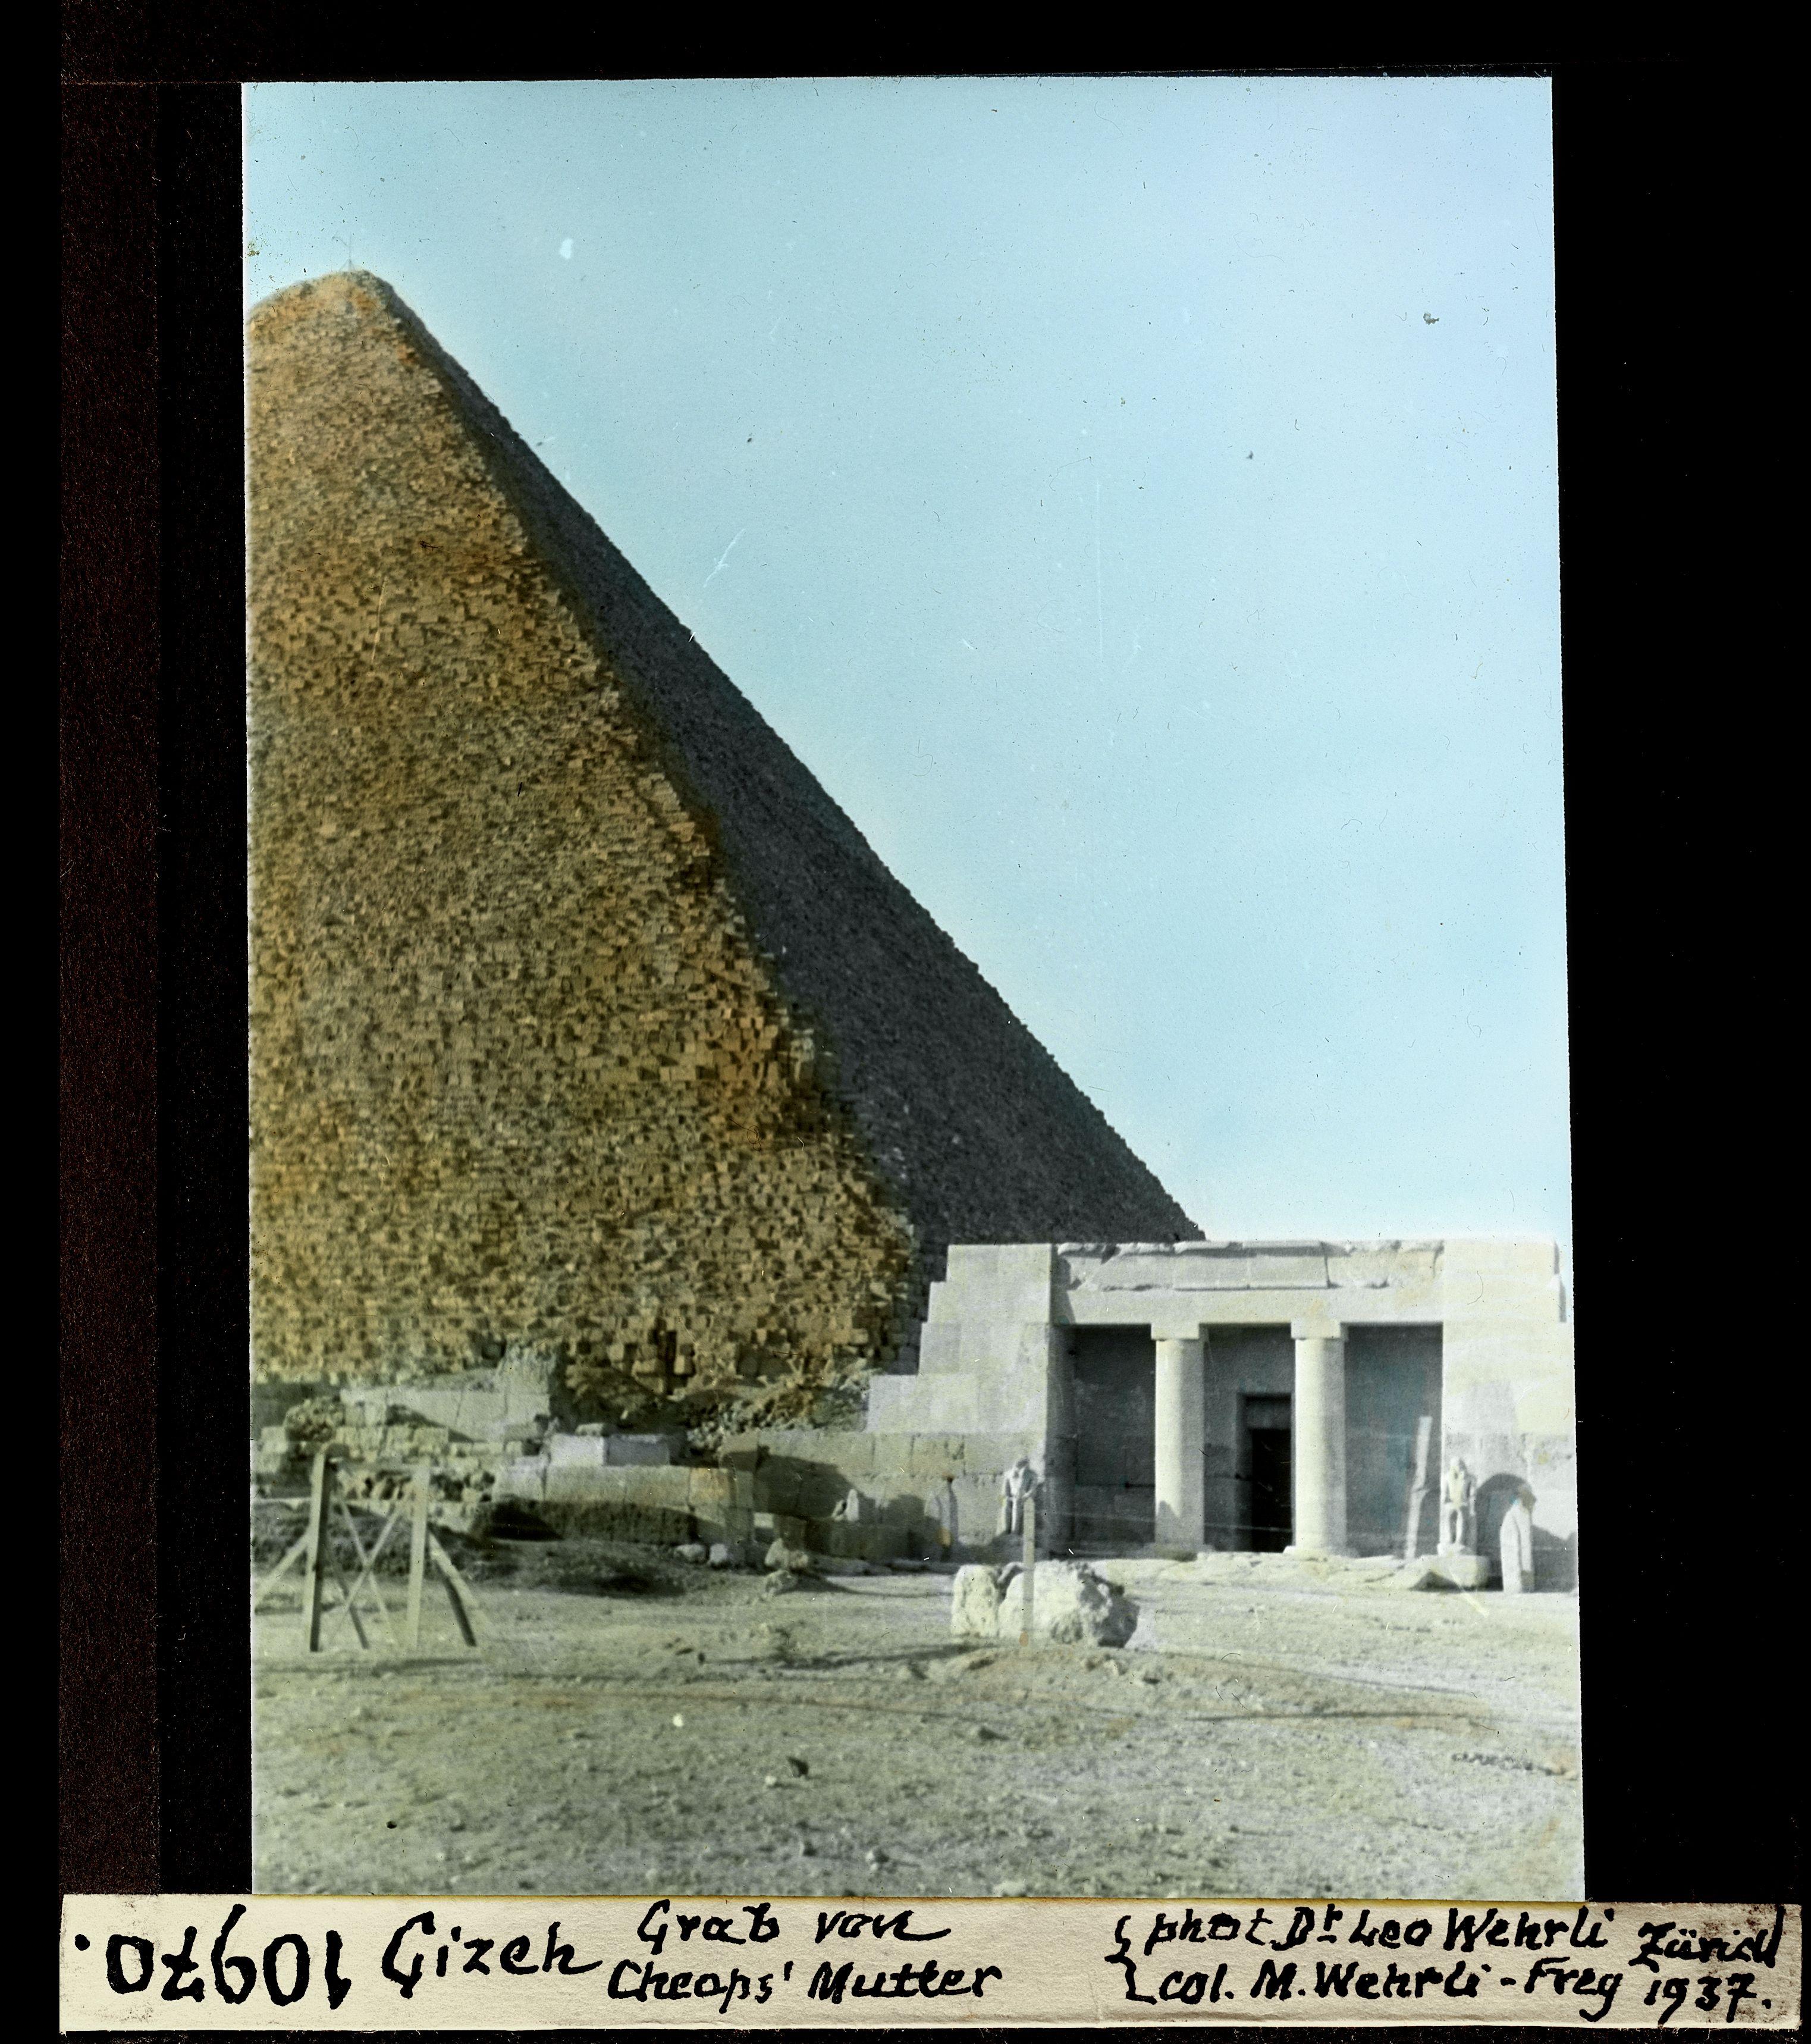 Гиза. Пирамида Хеопса, могила царицы Хетепхерес, матери Хеопса